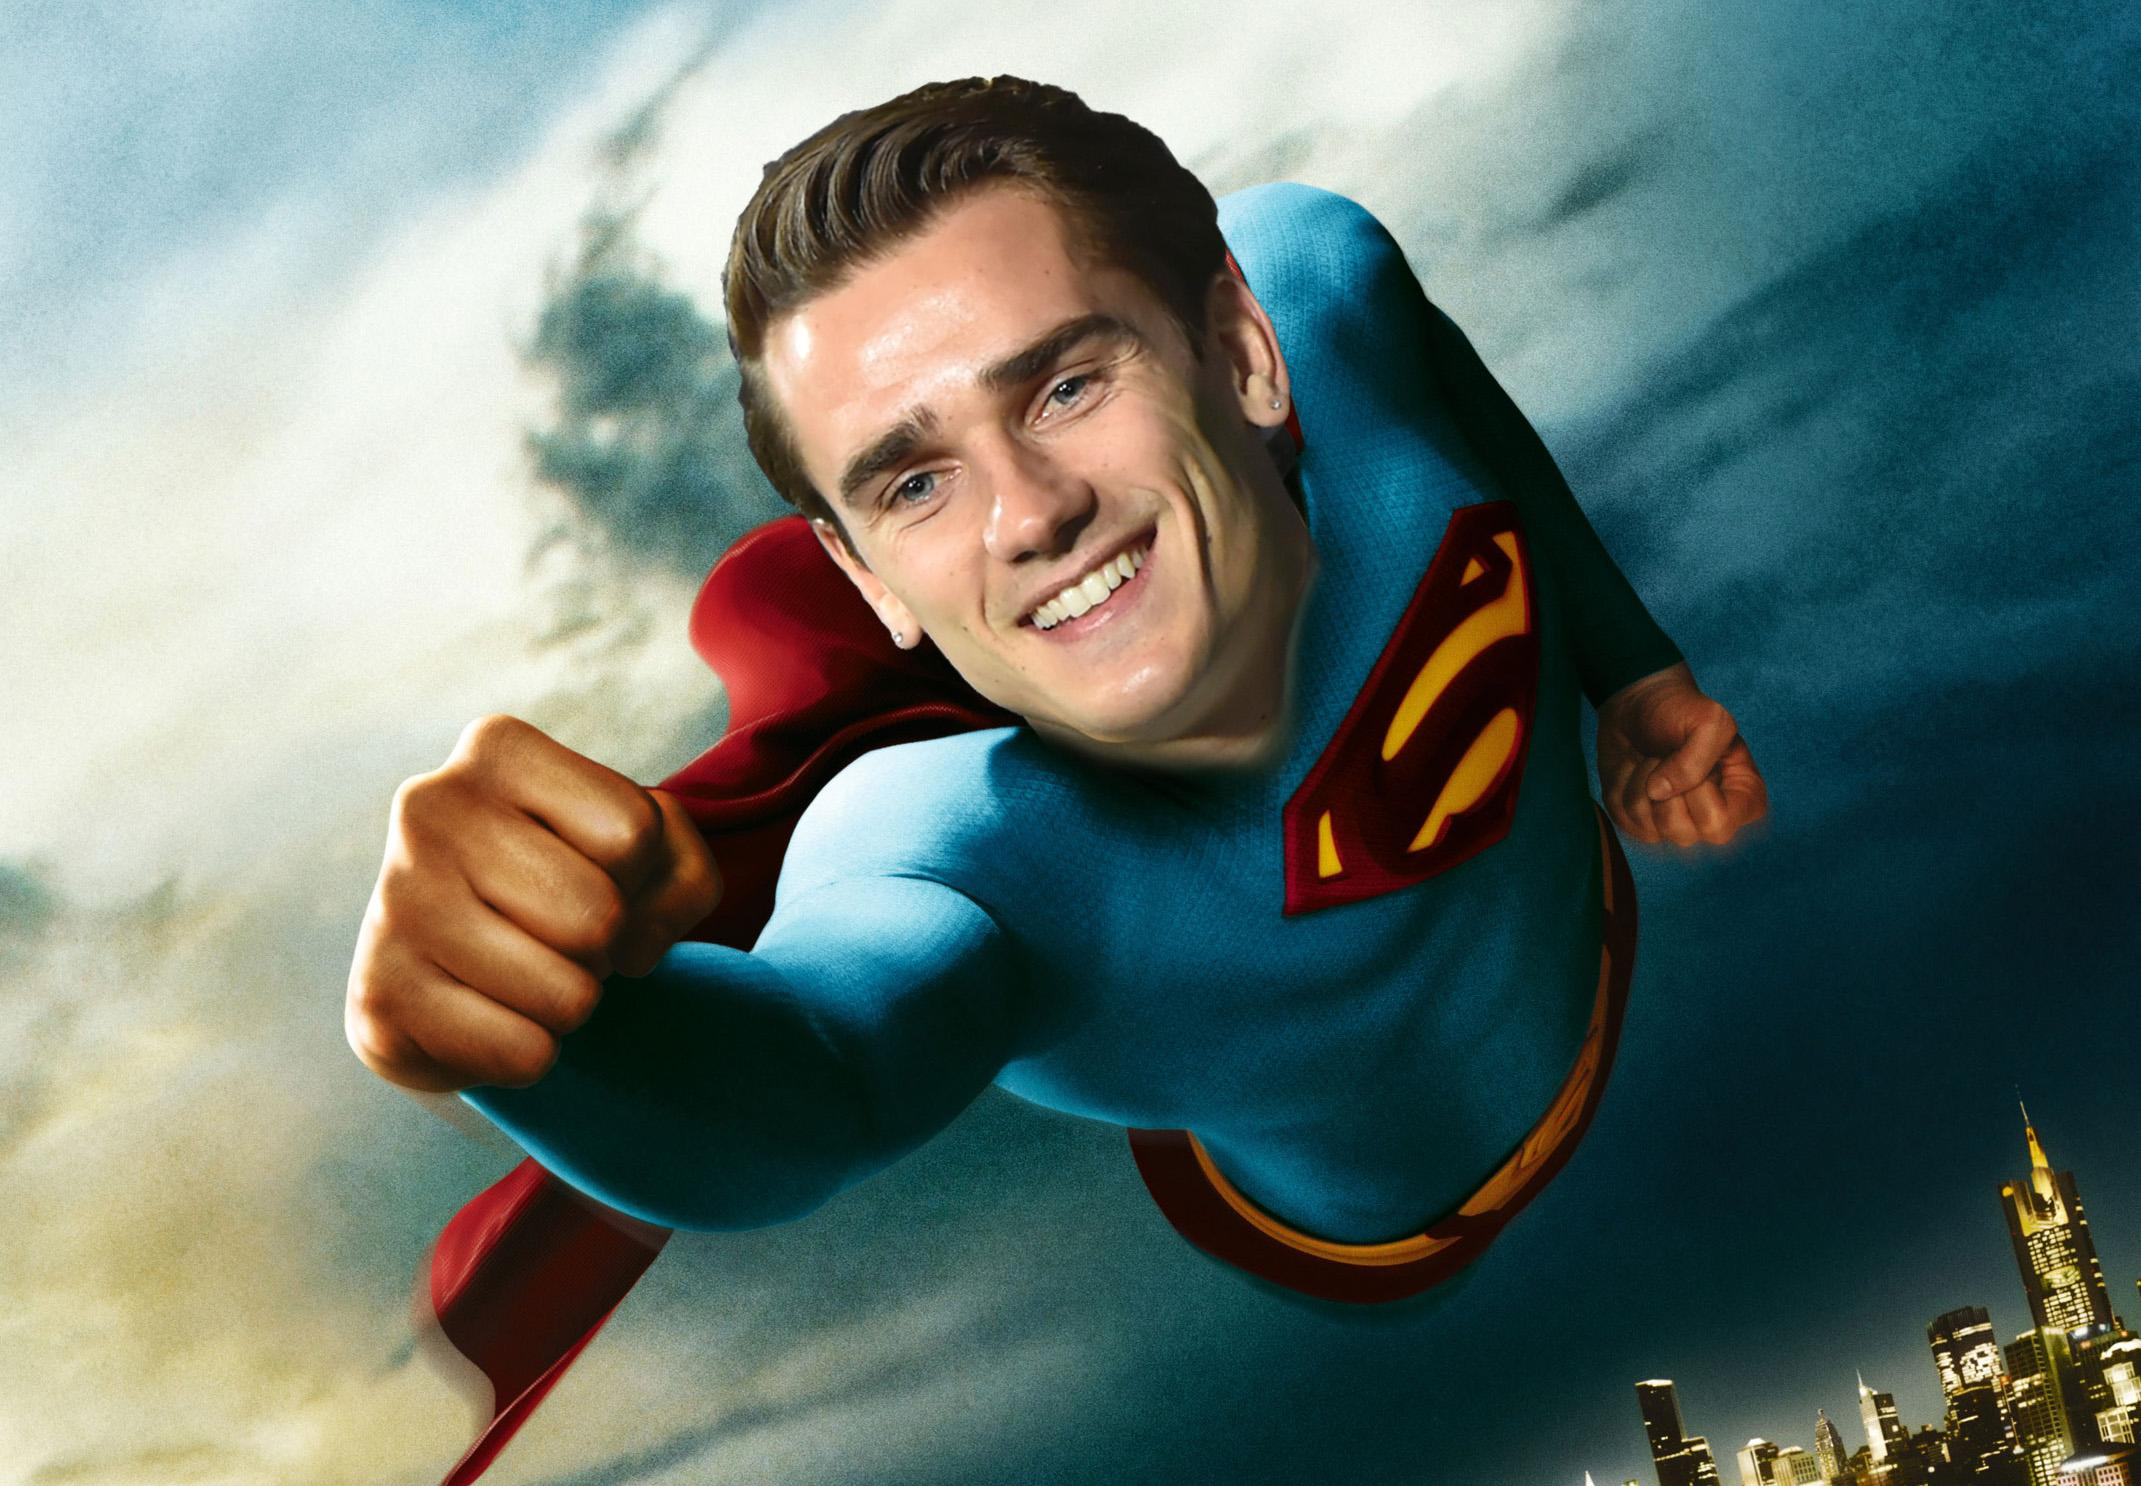 brandon routh superman - HD1920×1080